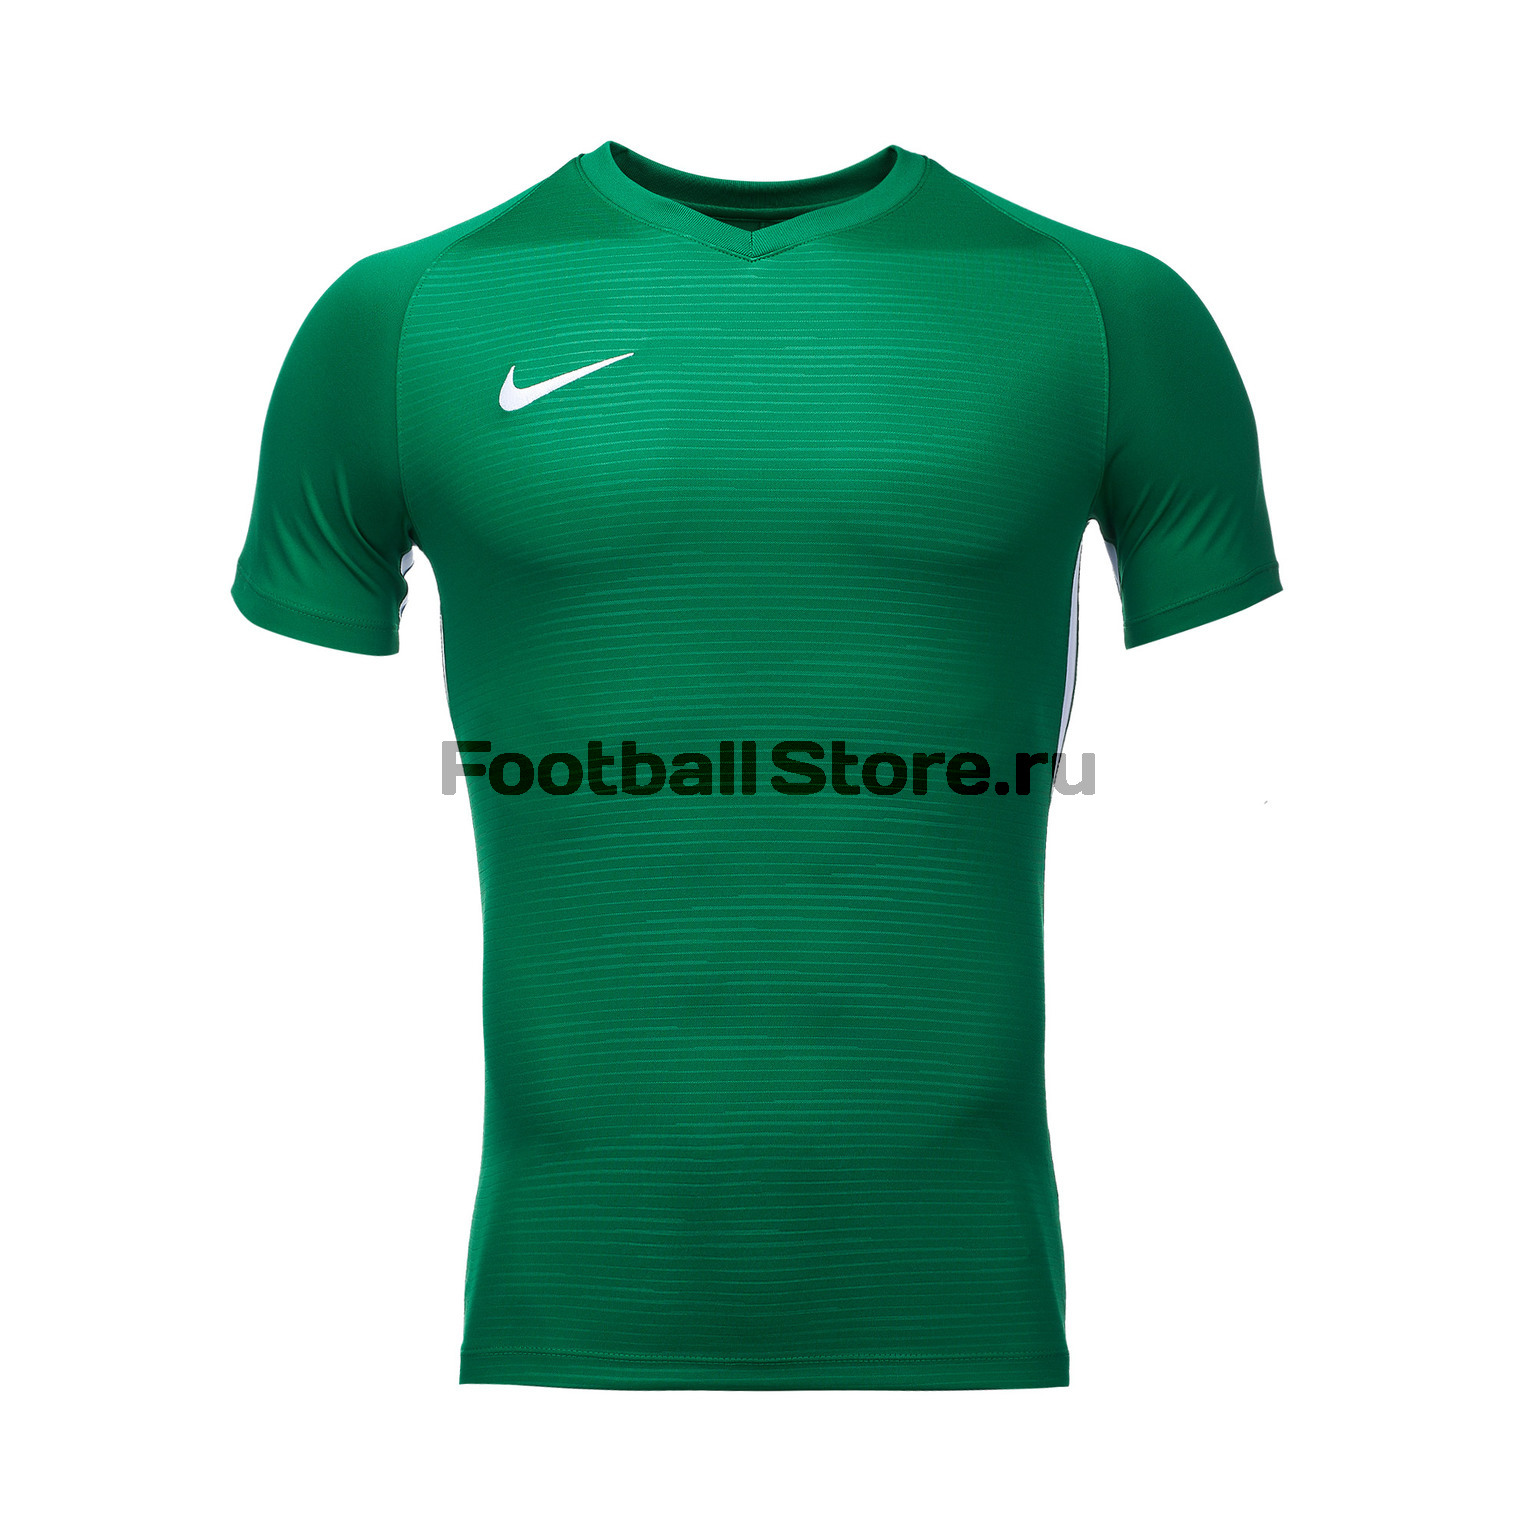 Футболка игровая Nike Dry Tiempo Prem JSY SS 894230-302 nike футболка zenit ss h a stadium jsy